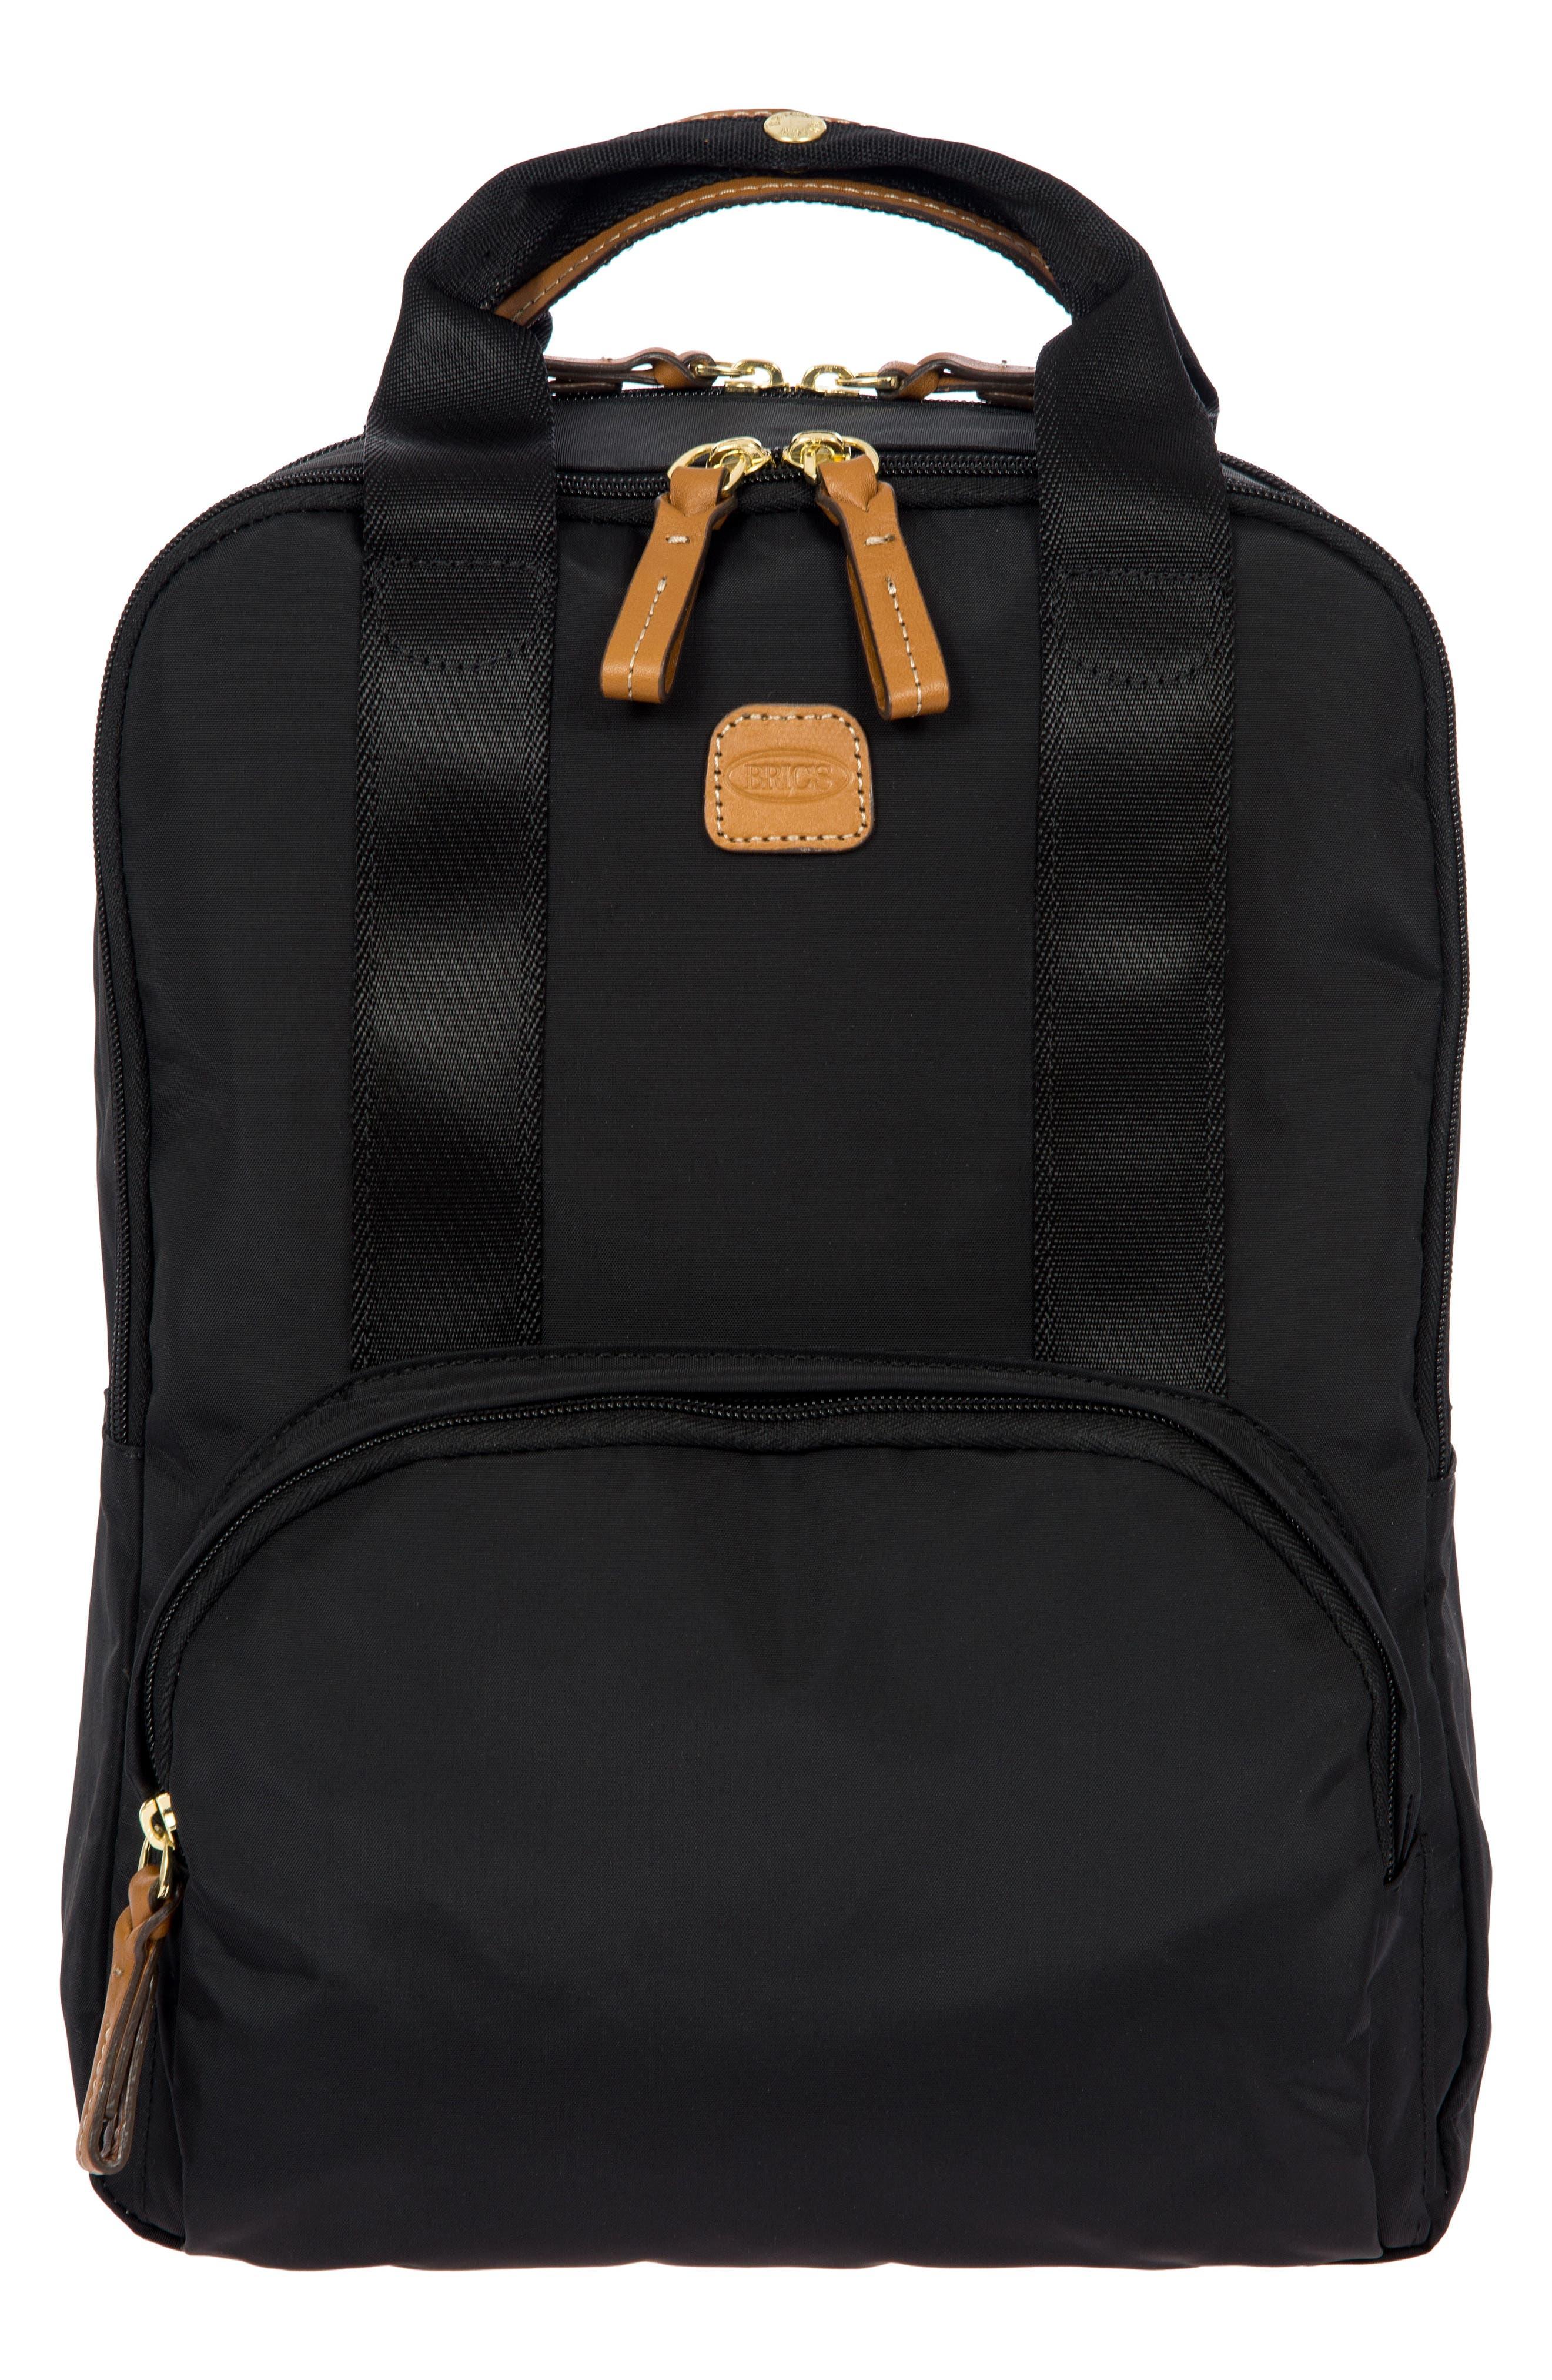 X-Bag Travel Backpack